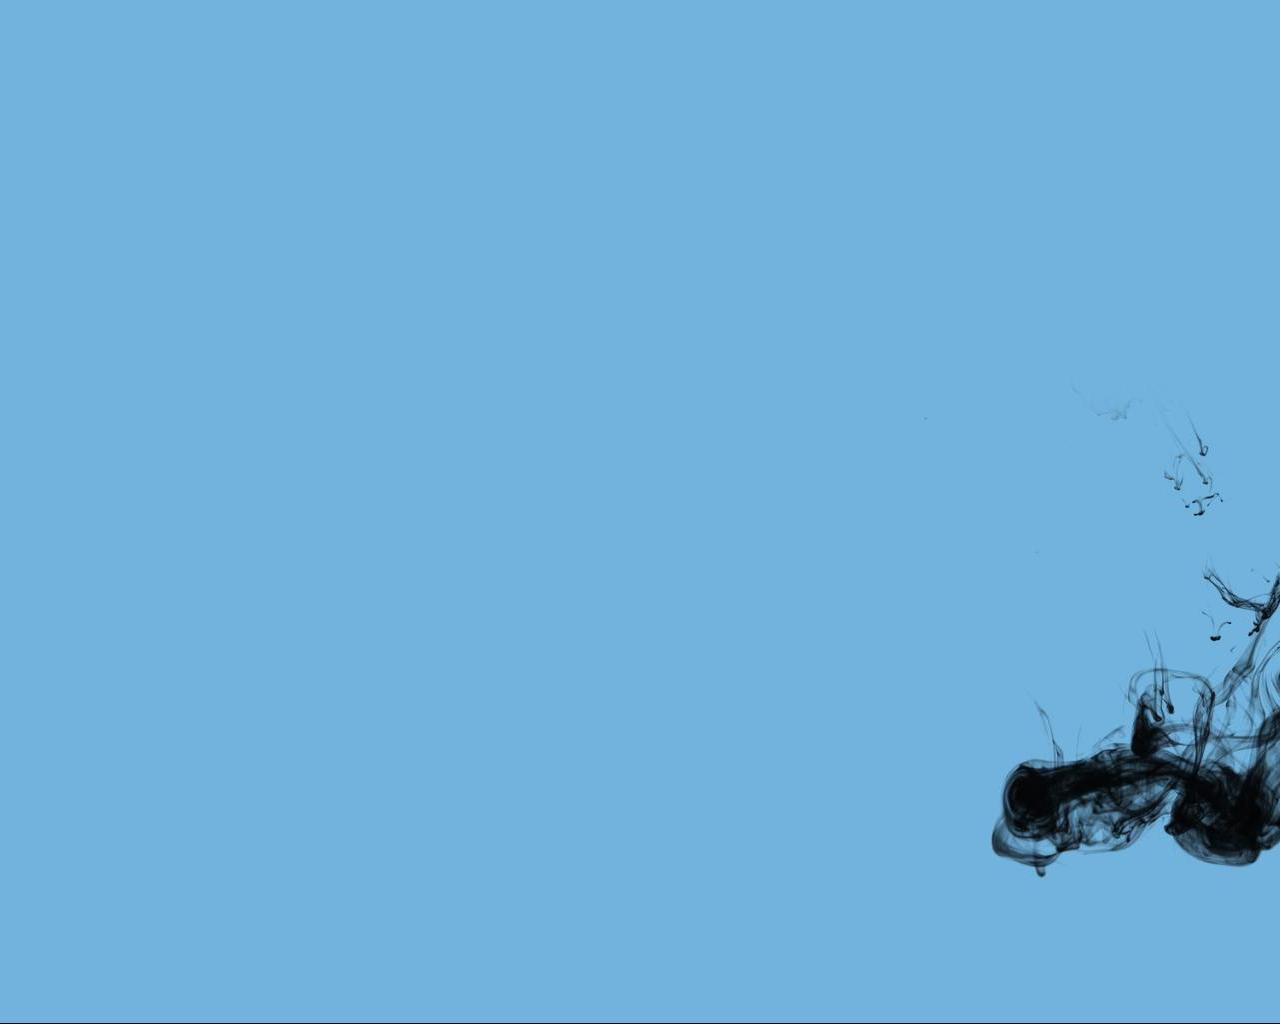 1280x1024 Baby Blue Black Wallpaper Blue Wallpapers 1280x1024